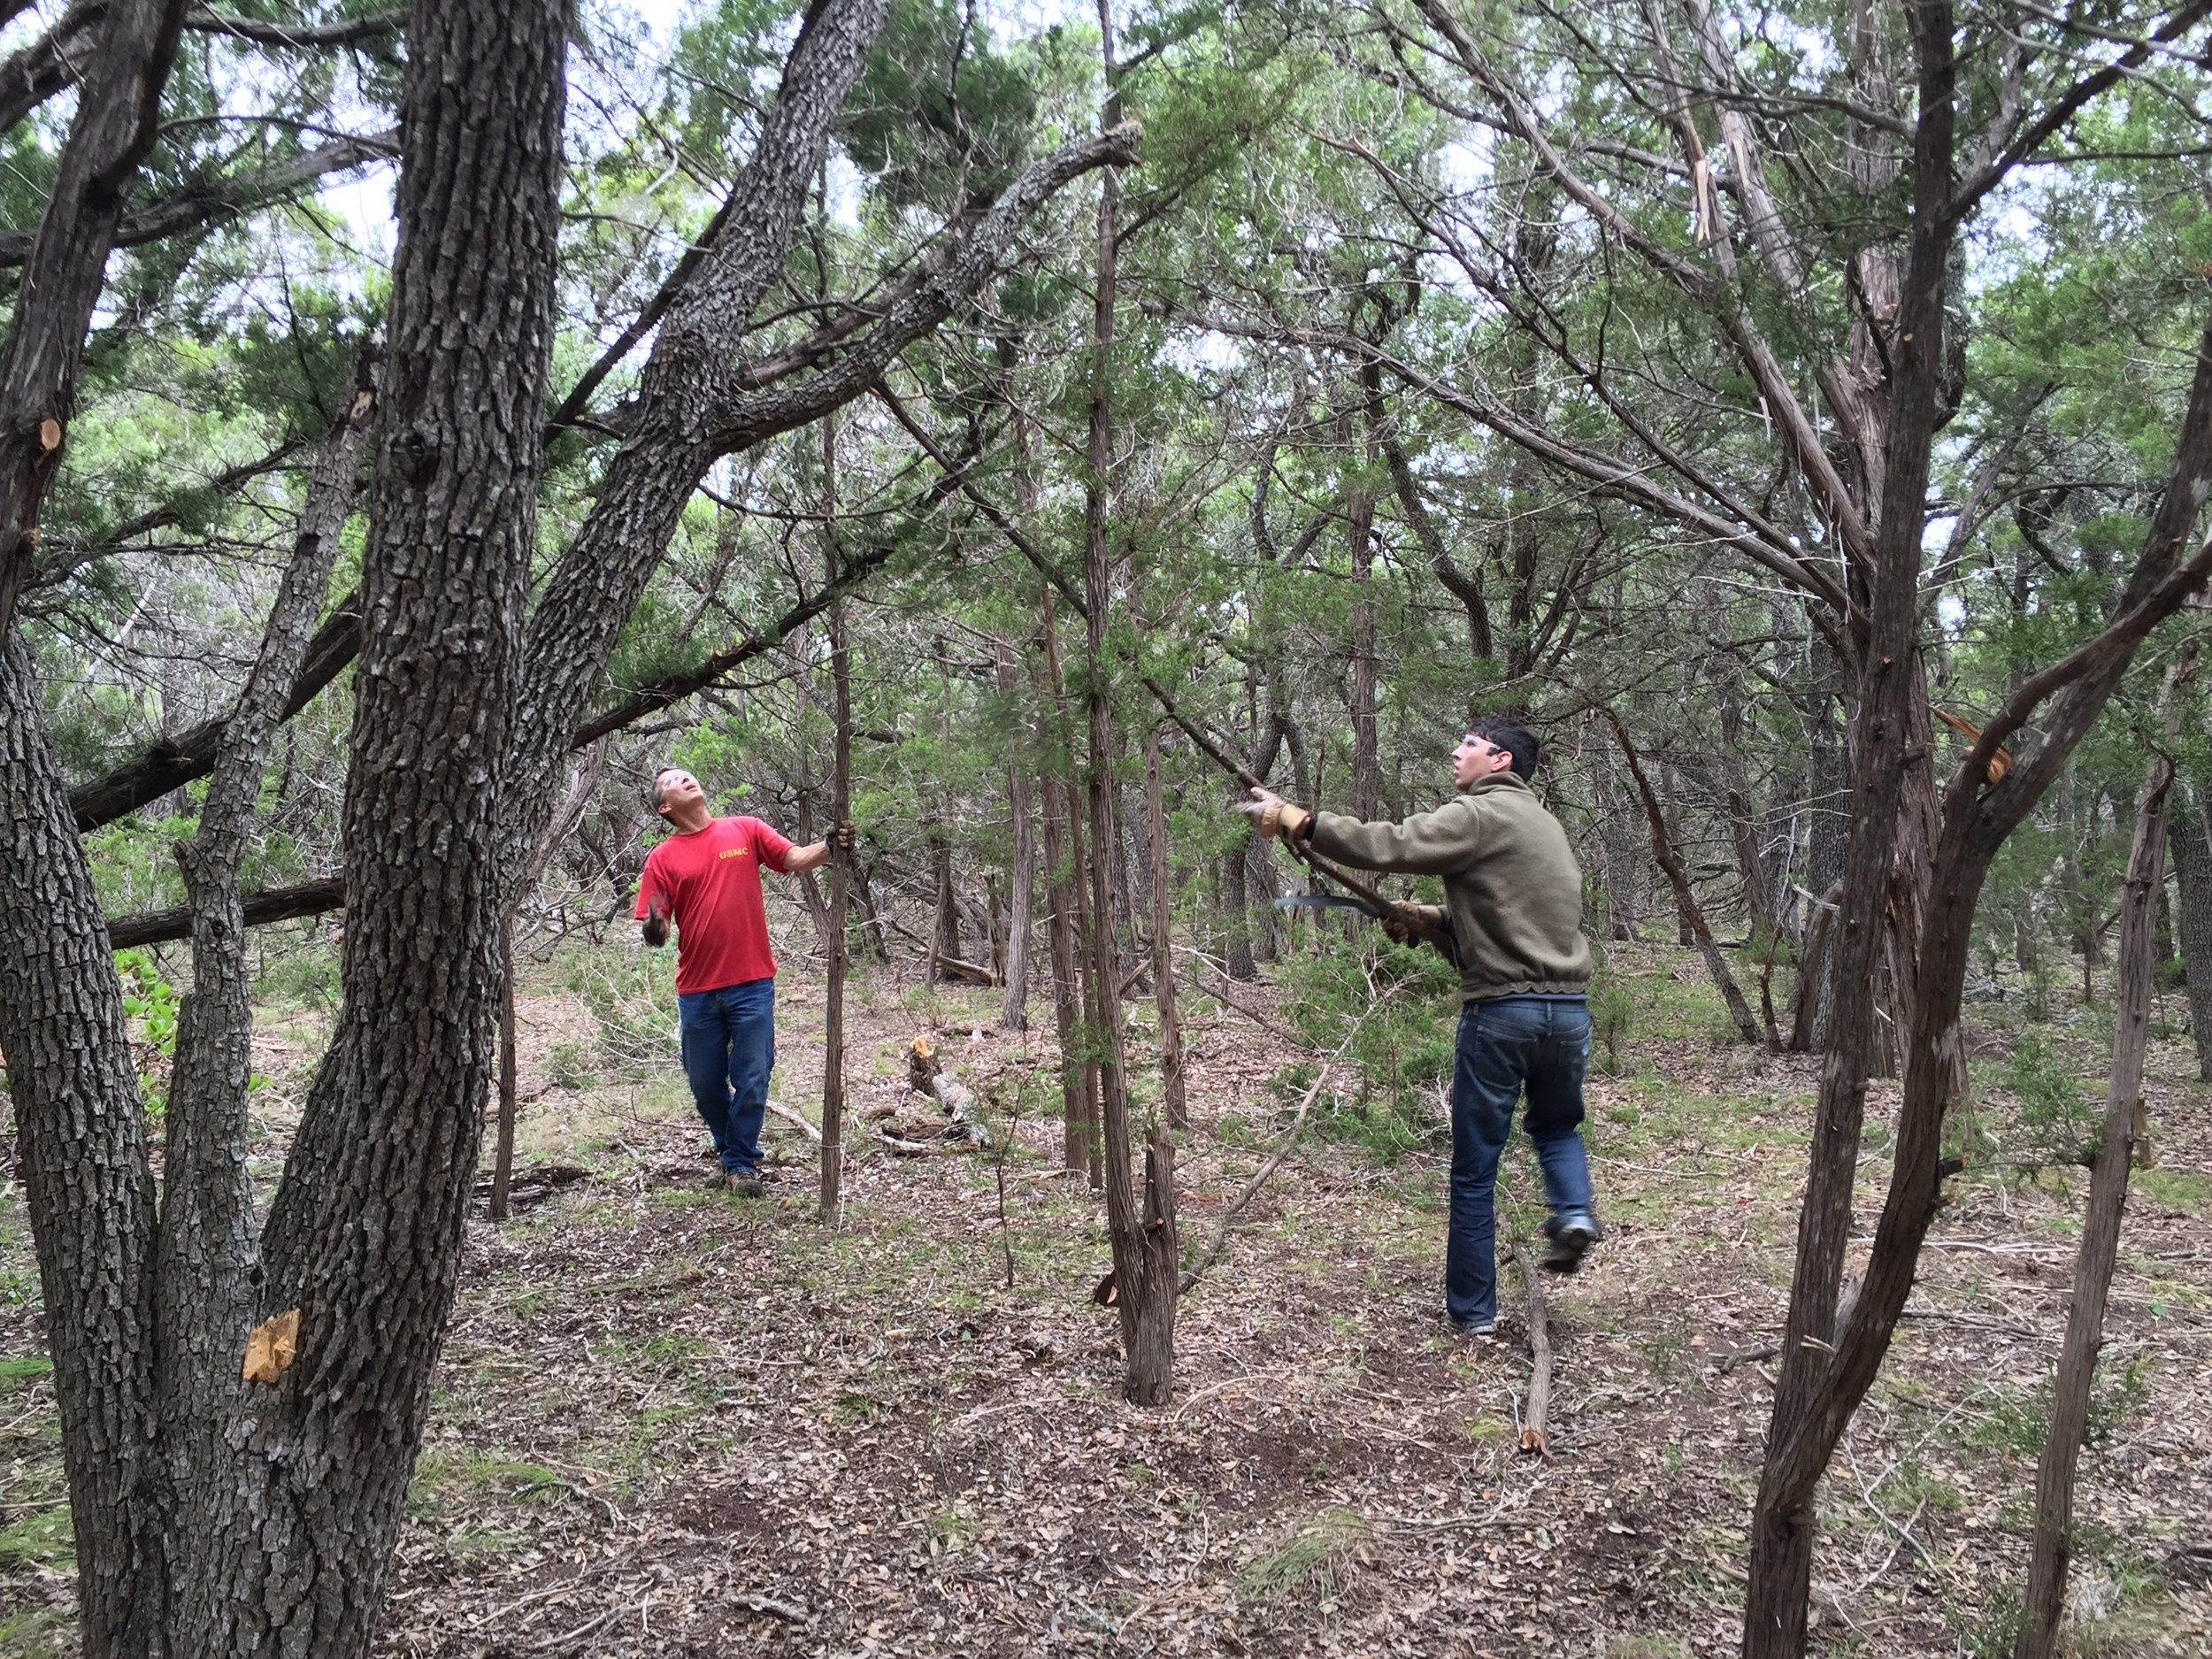 Joe and tyler clearing small cedars